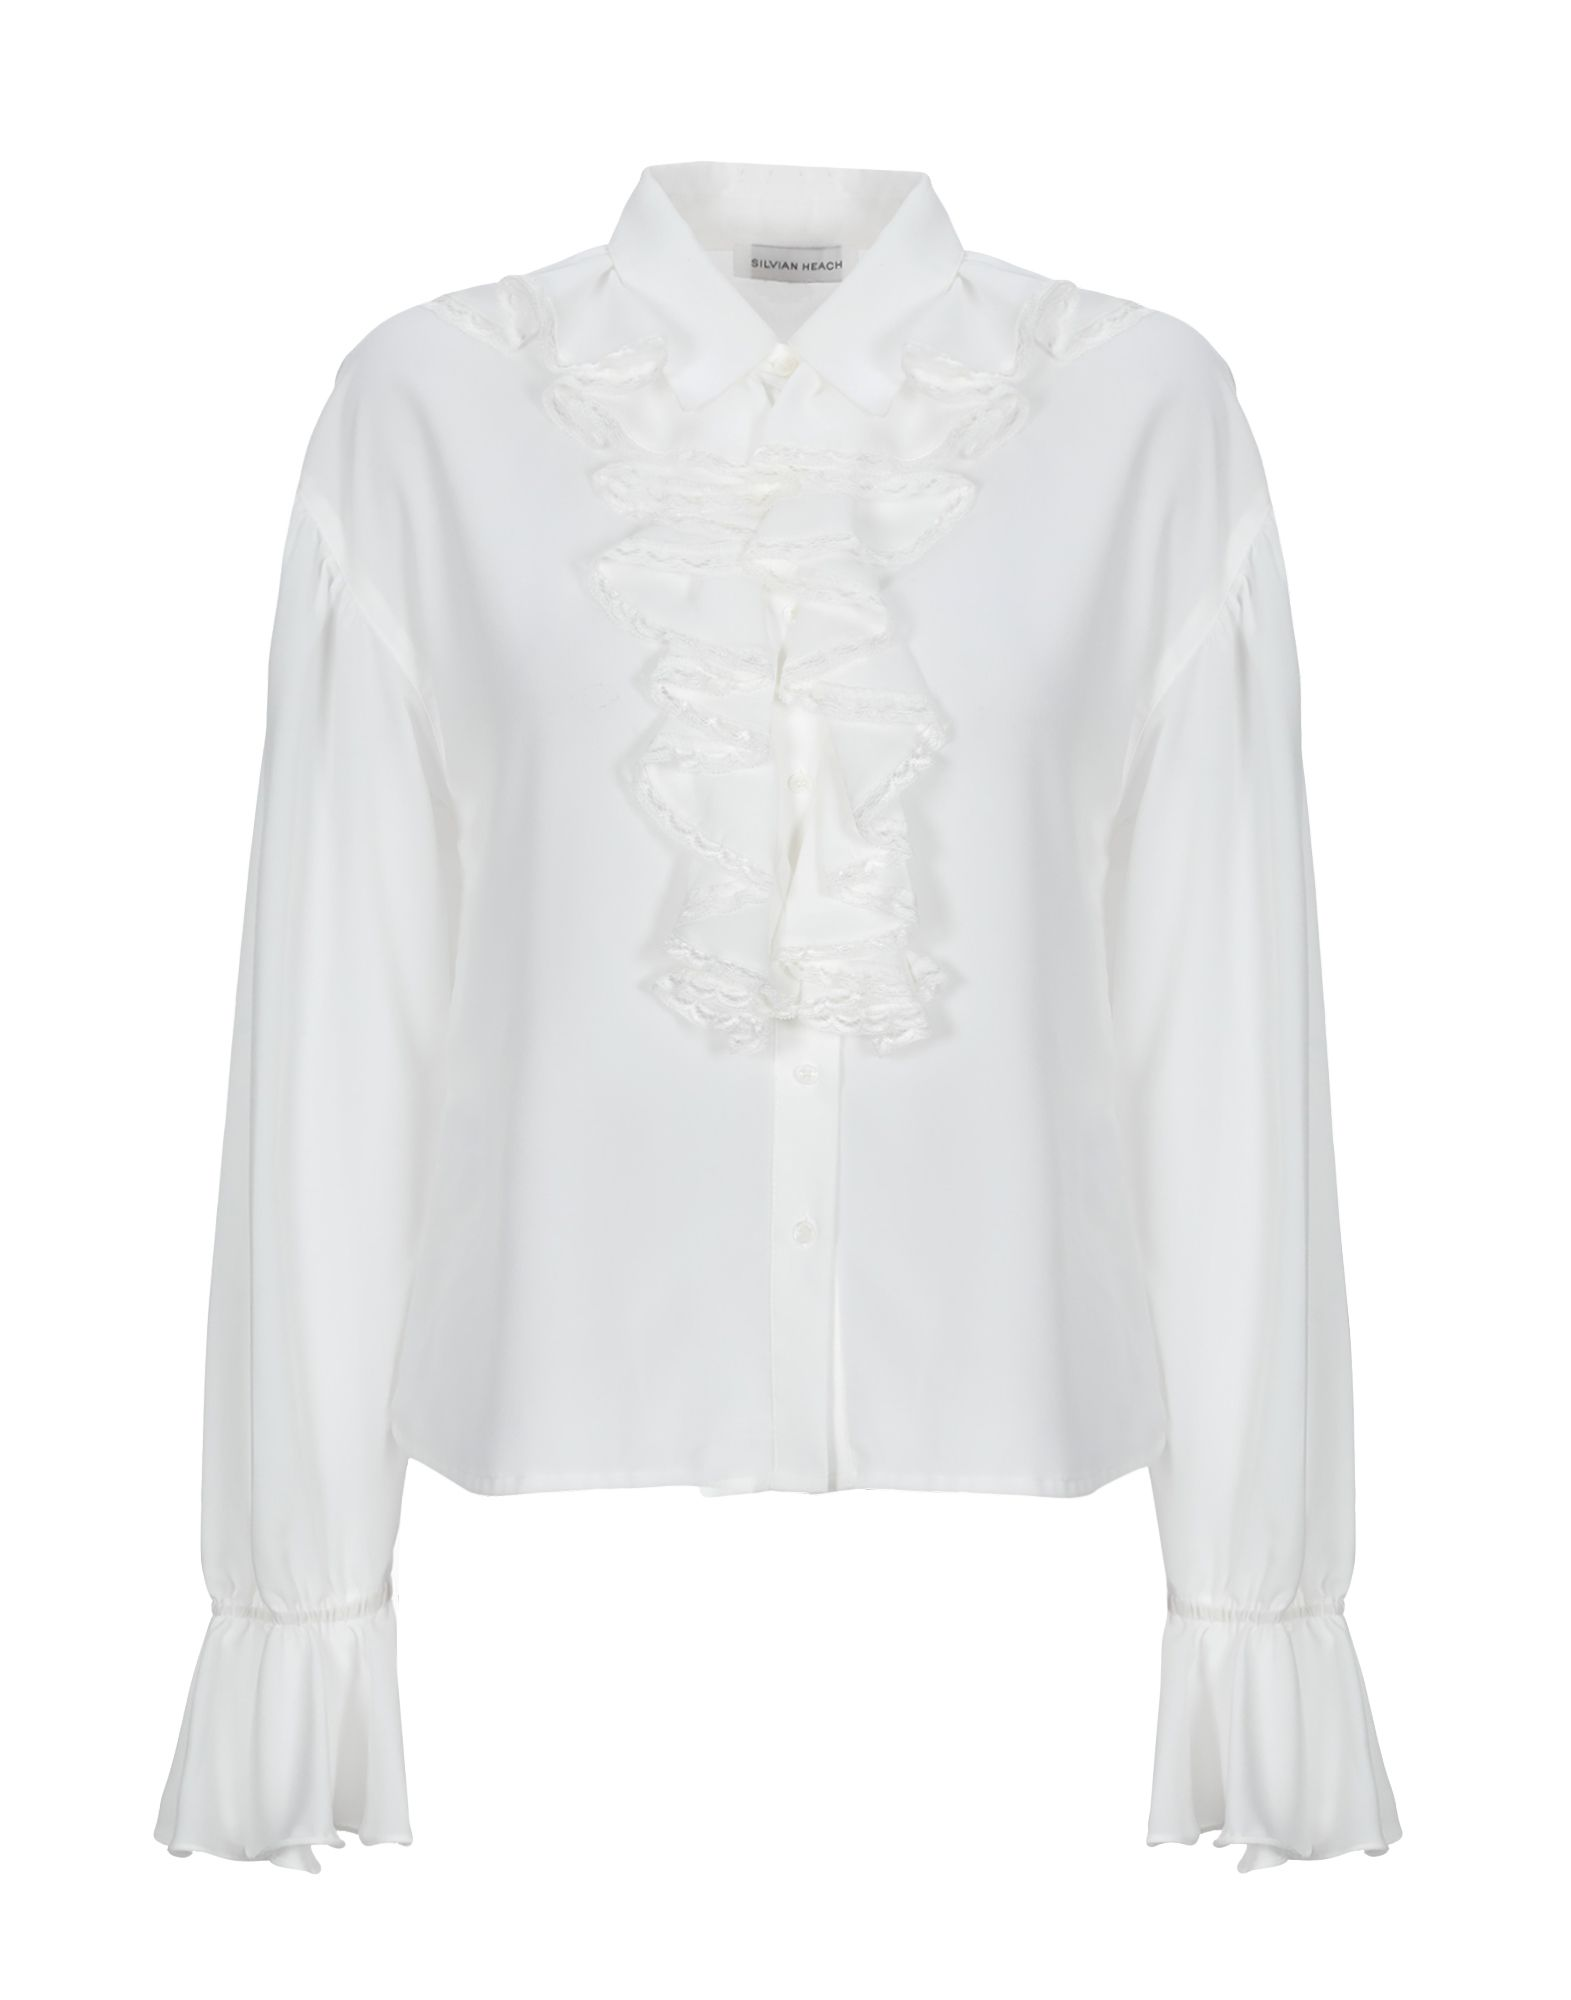 Camicie E bluse Tinta Unita Unita Silvian Heach donna - 38856934GR  befasst sich mit Verkauf